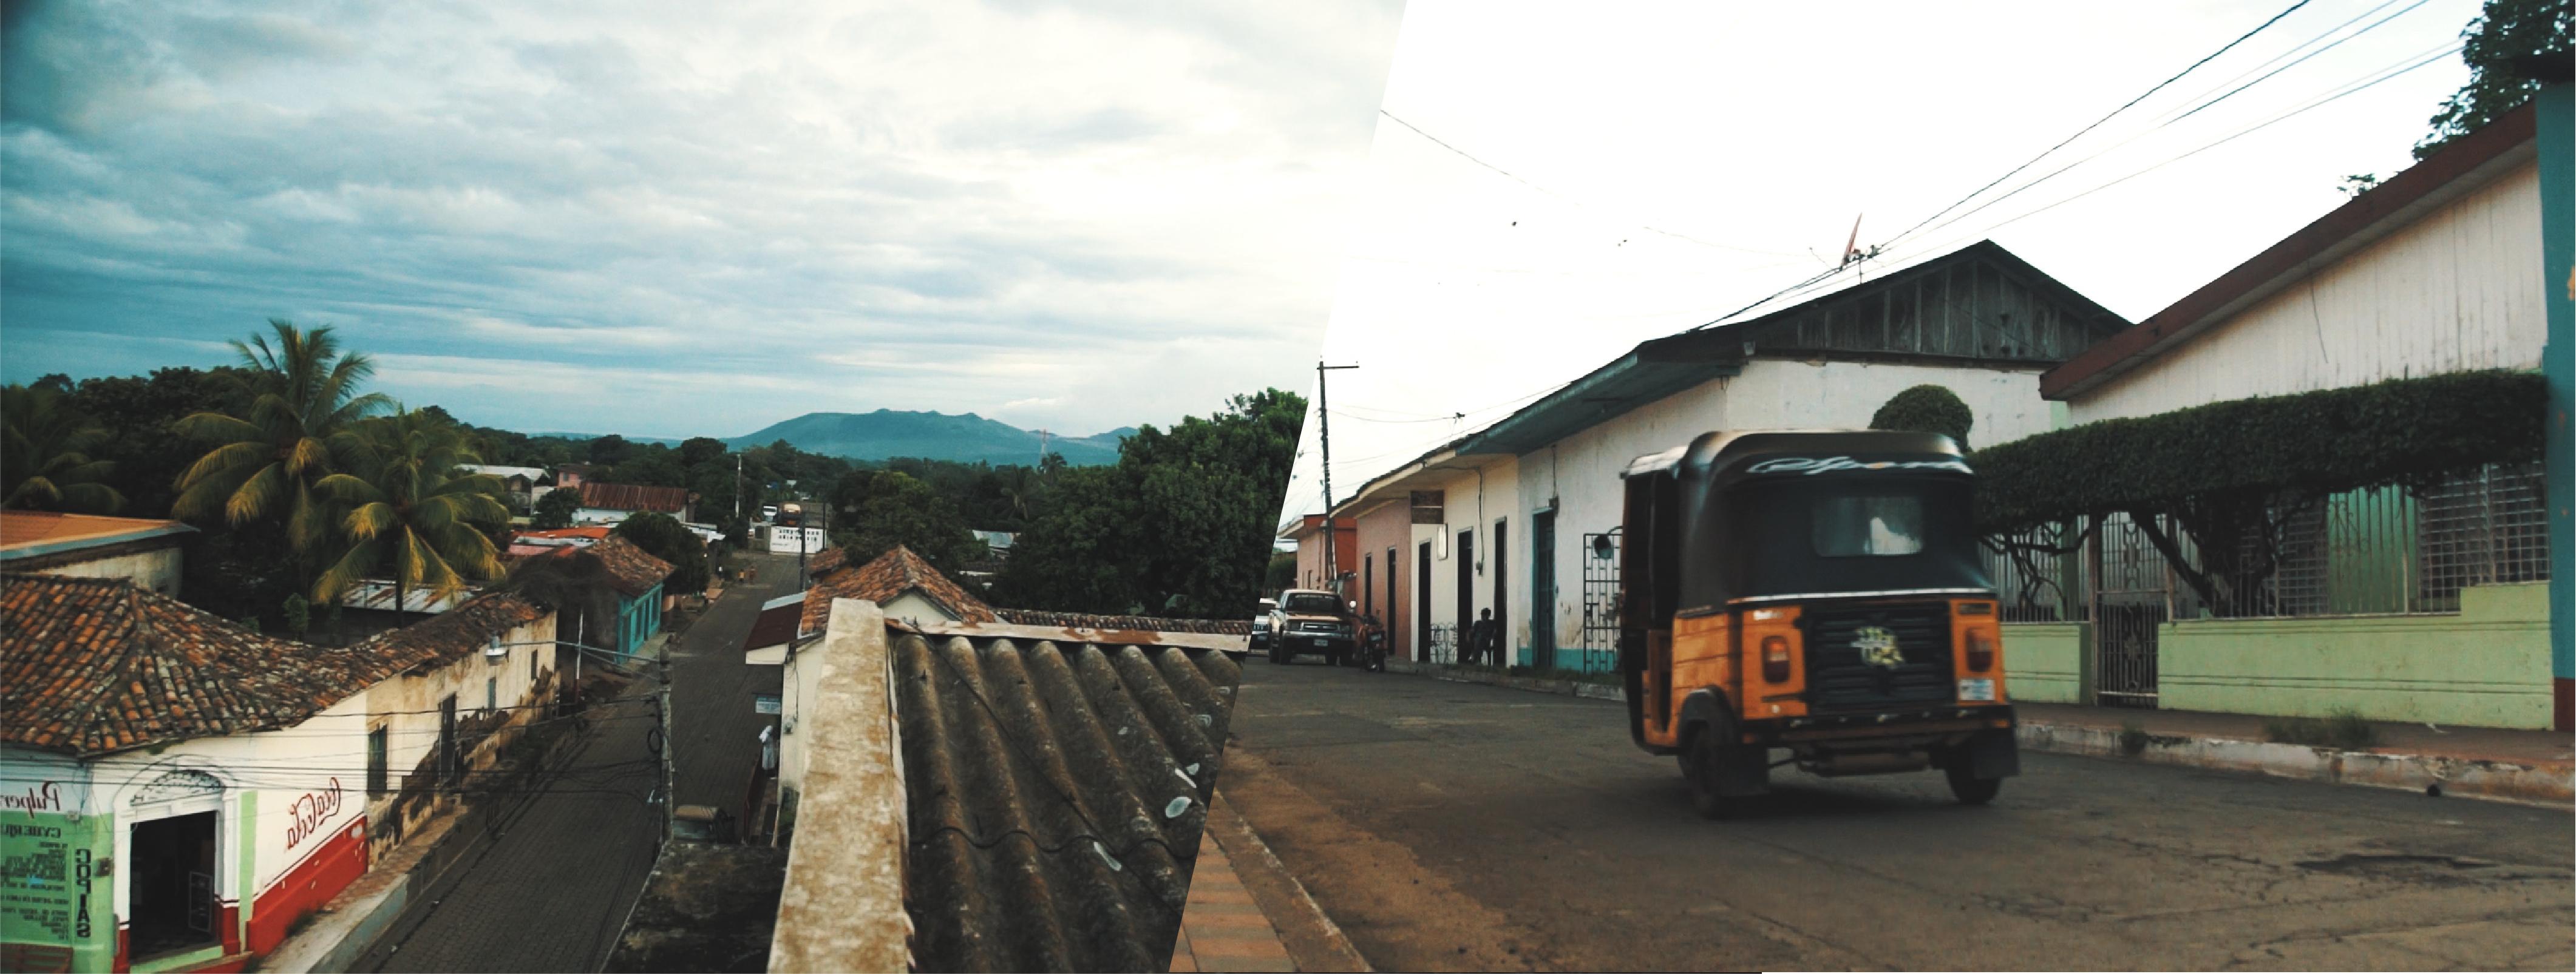 Photos of Masatepe, Nicaragua